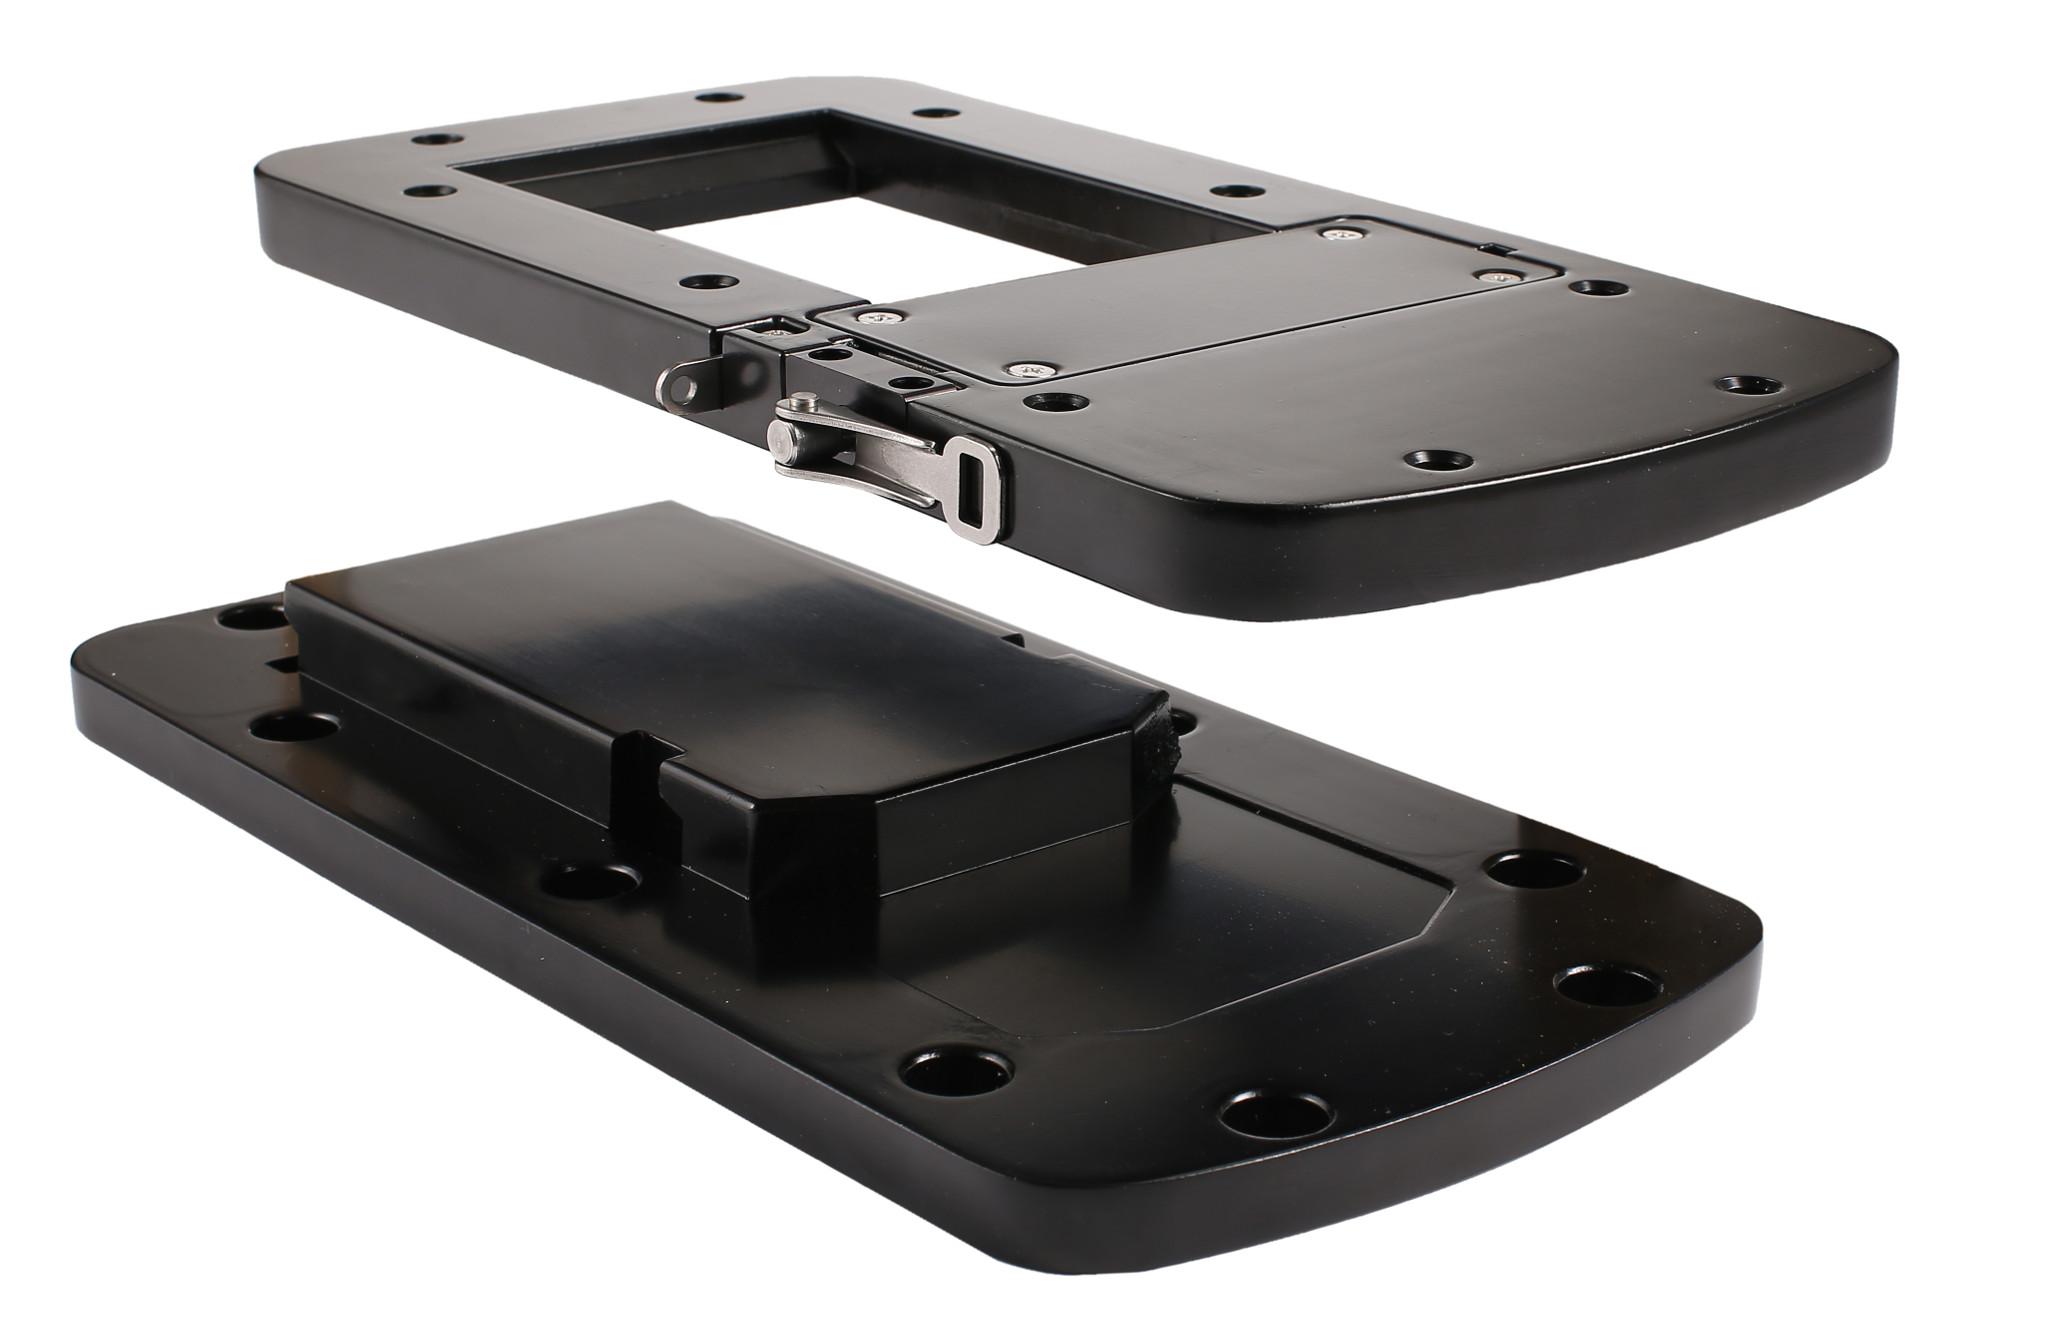 MotorGuide Xi5 Quick Release Montageplatte aus Aluminium, Schwarz – Bild 3